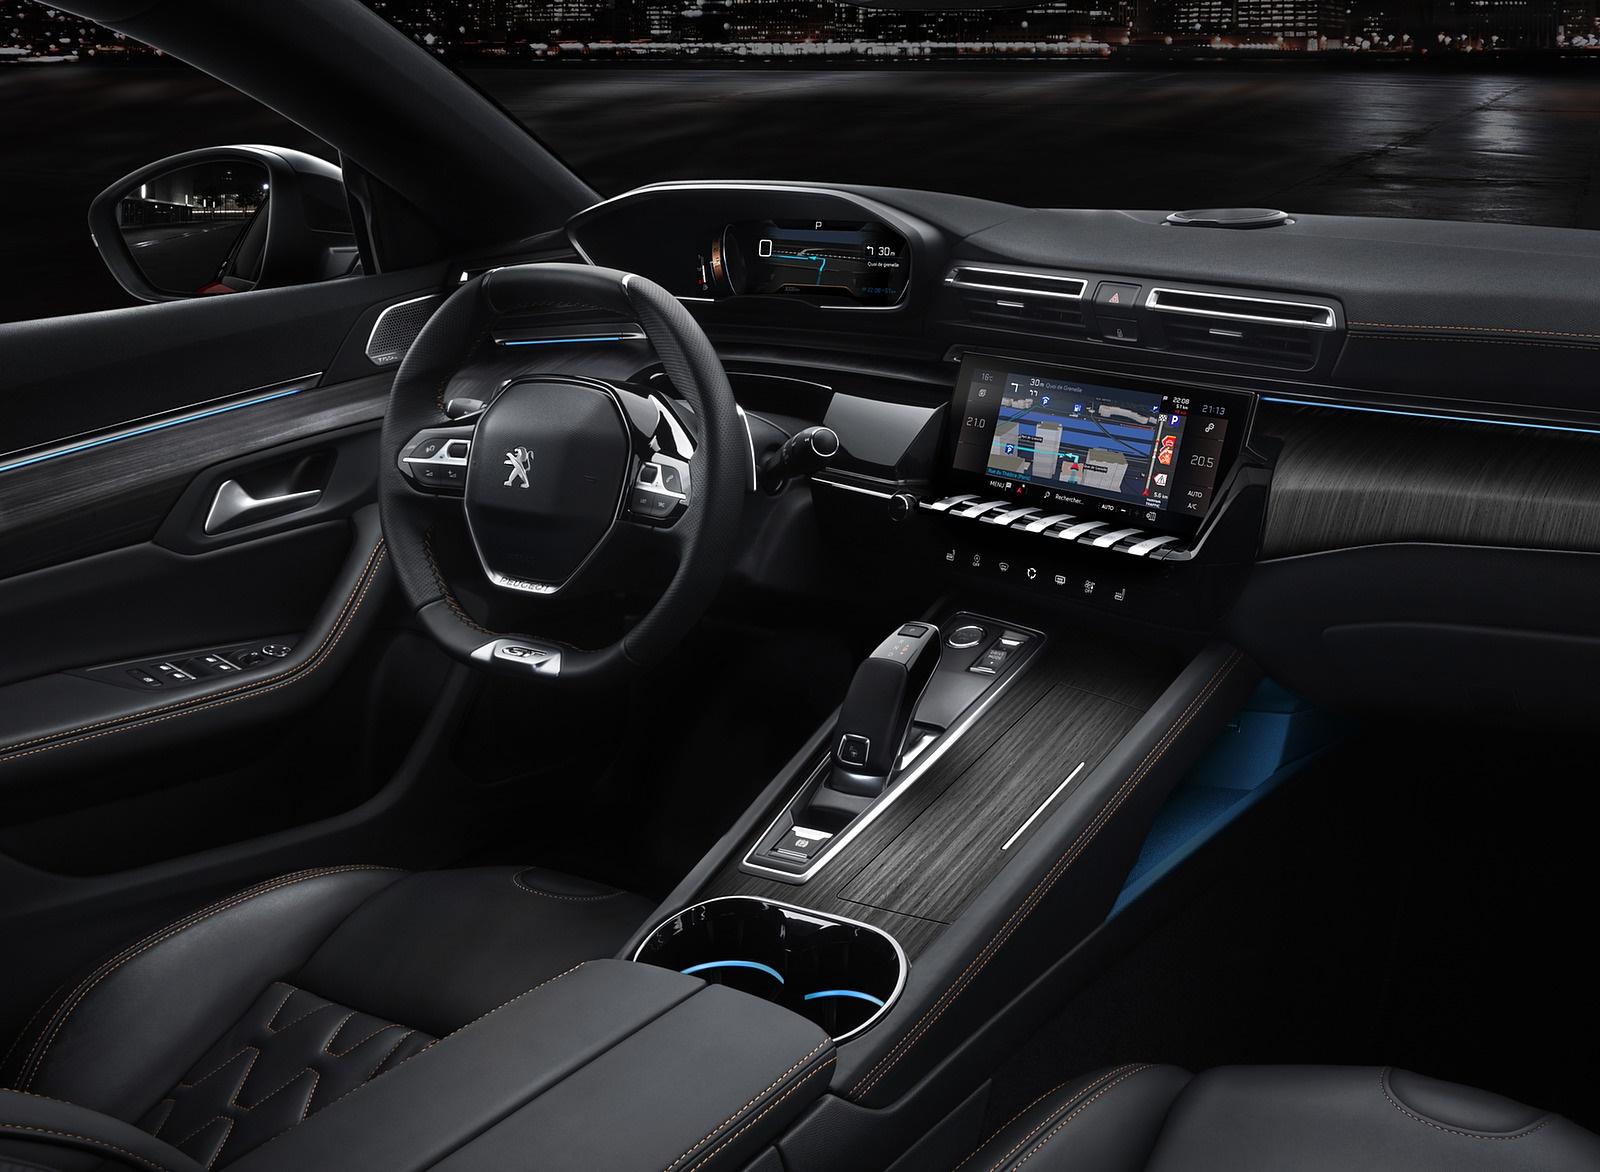 2019 Peugeot 508 Interior Wallpapers (7)